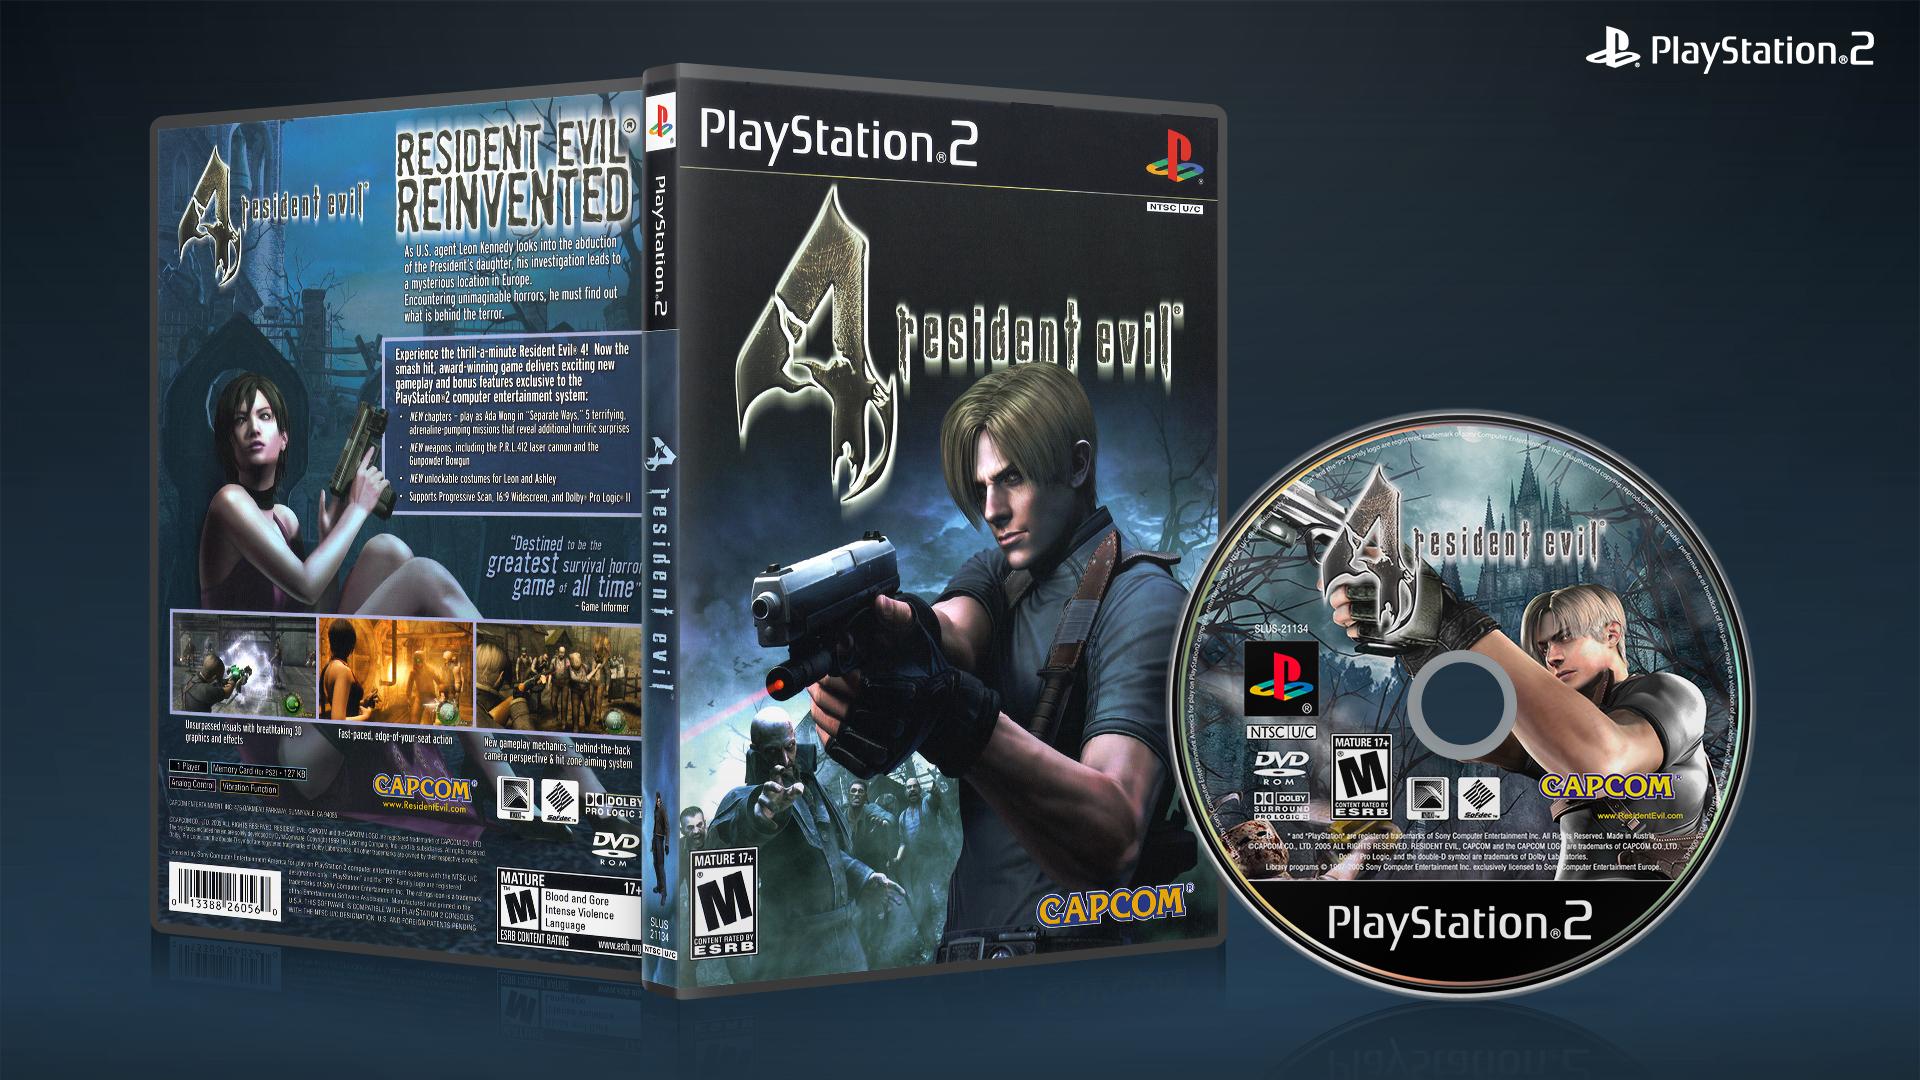 Ps2 Resident Evil 4 Dvd Cover 01 By Xovyant On Deviantart